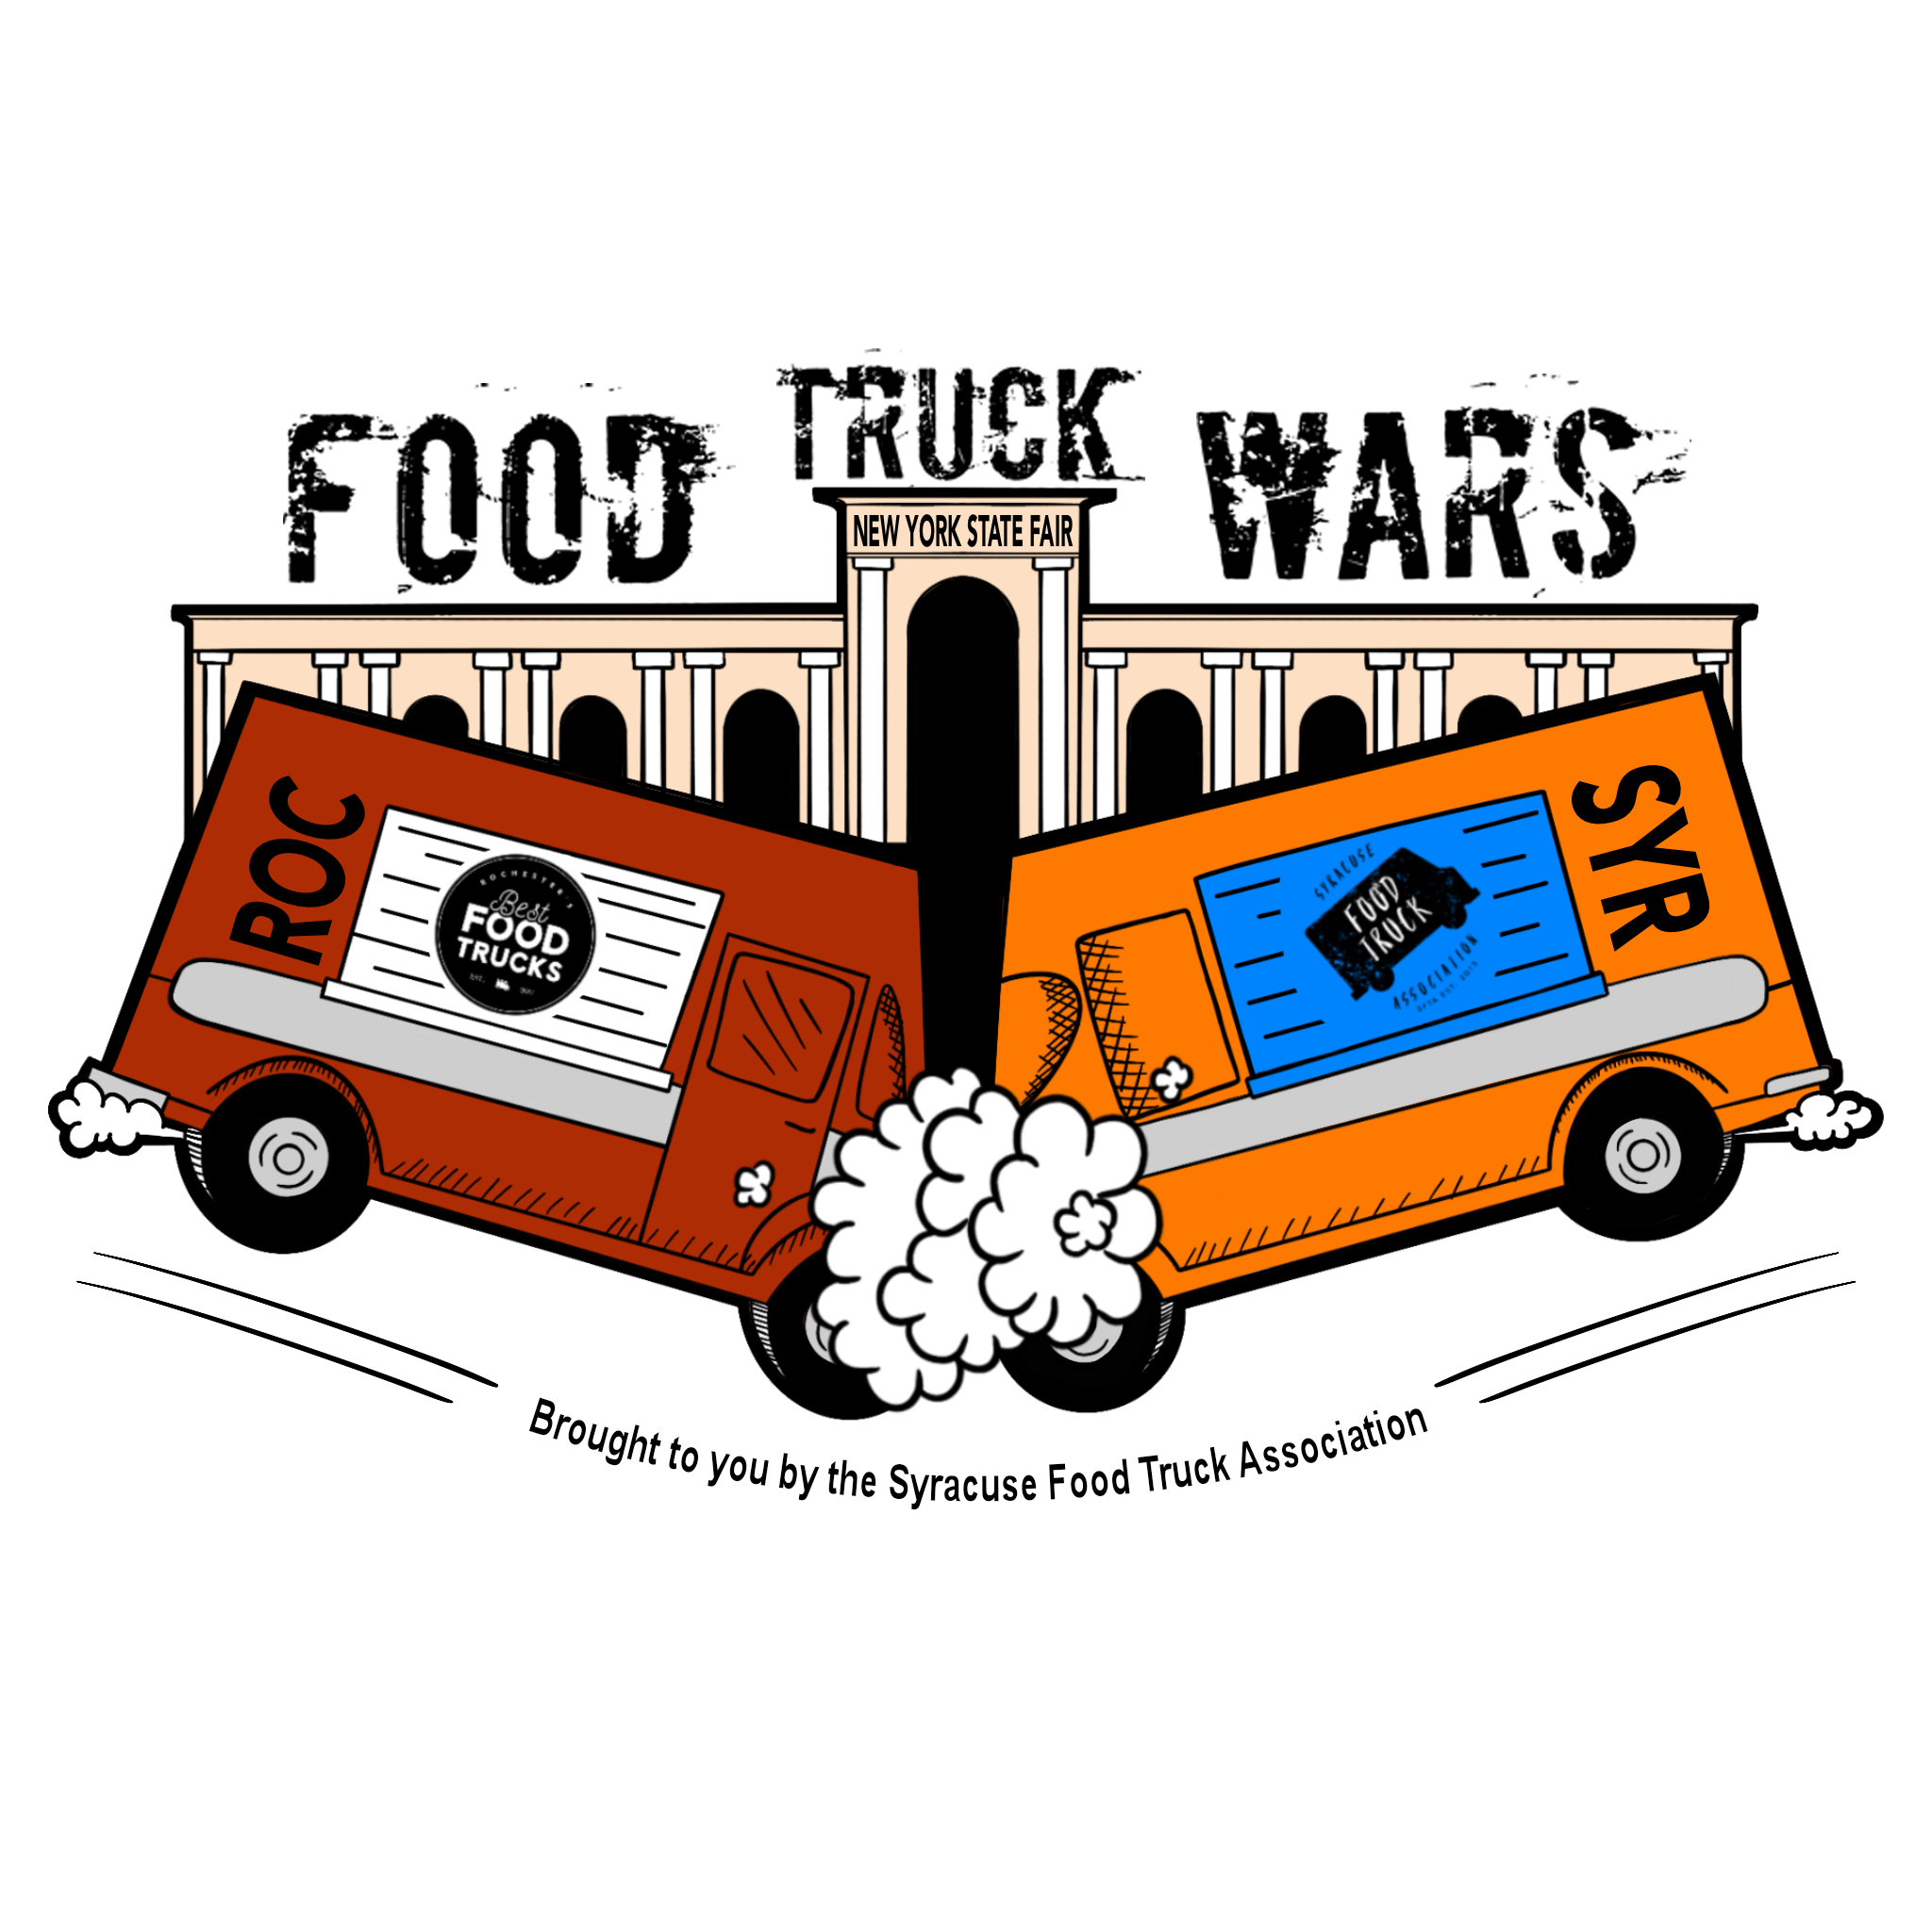 Food Truck Wars | May 30th